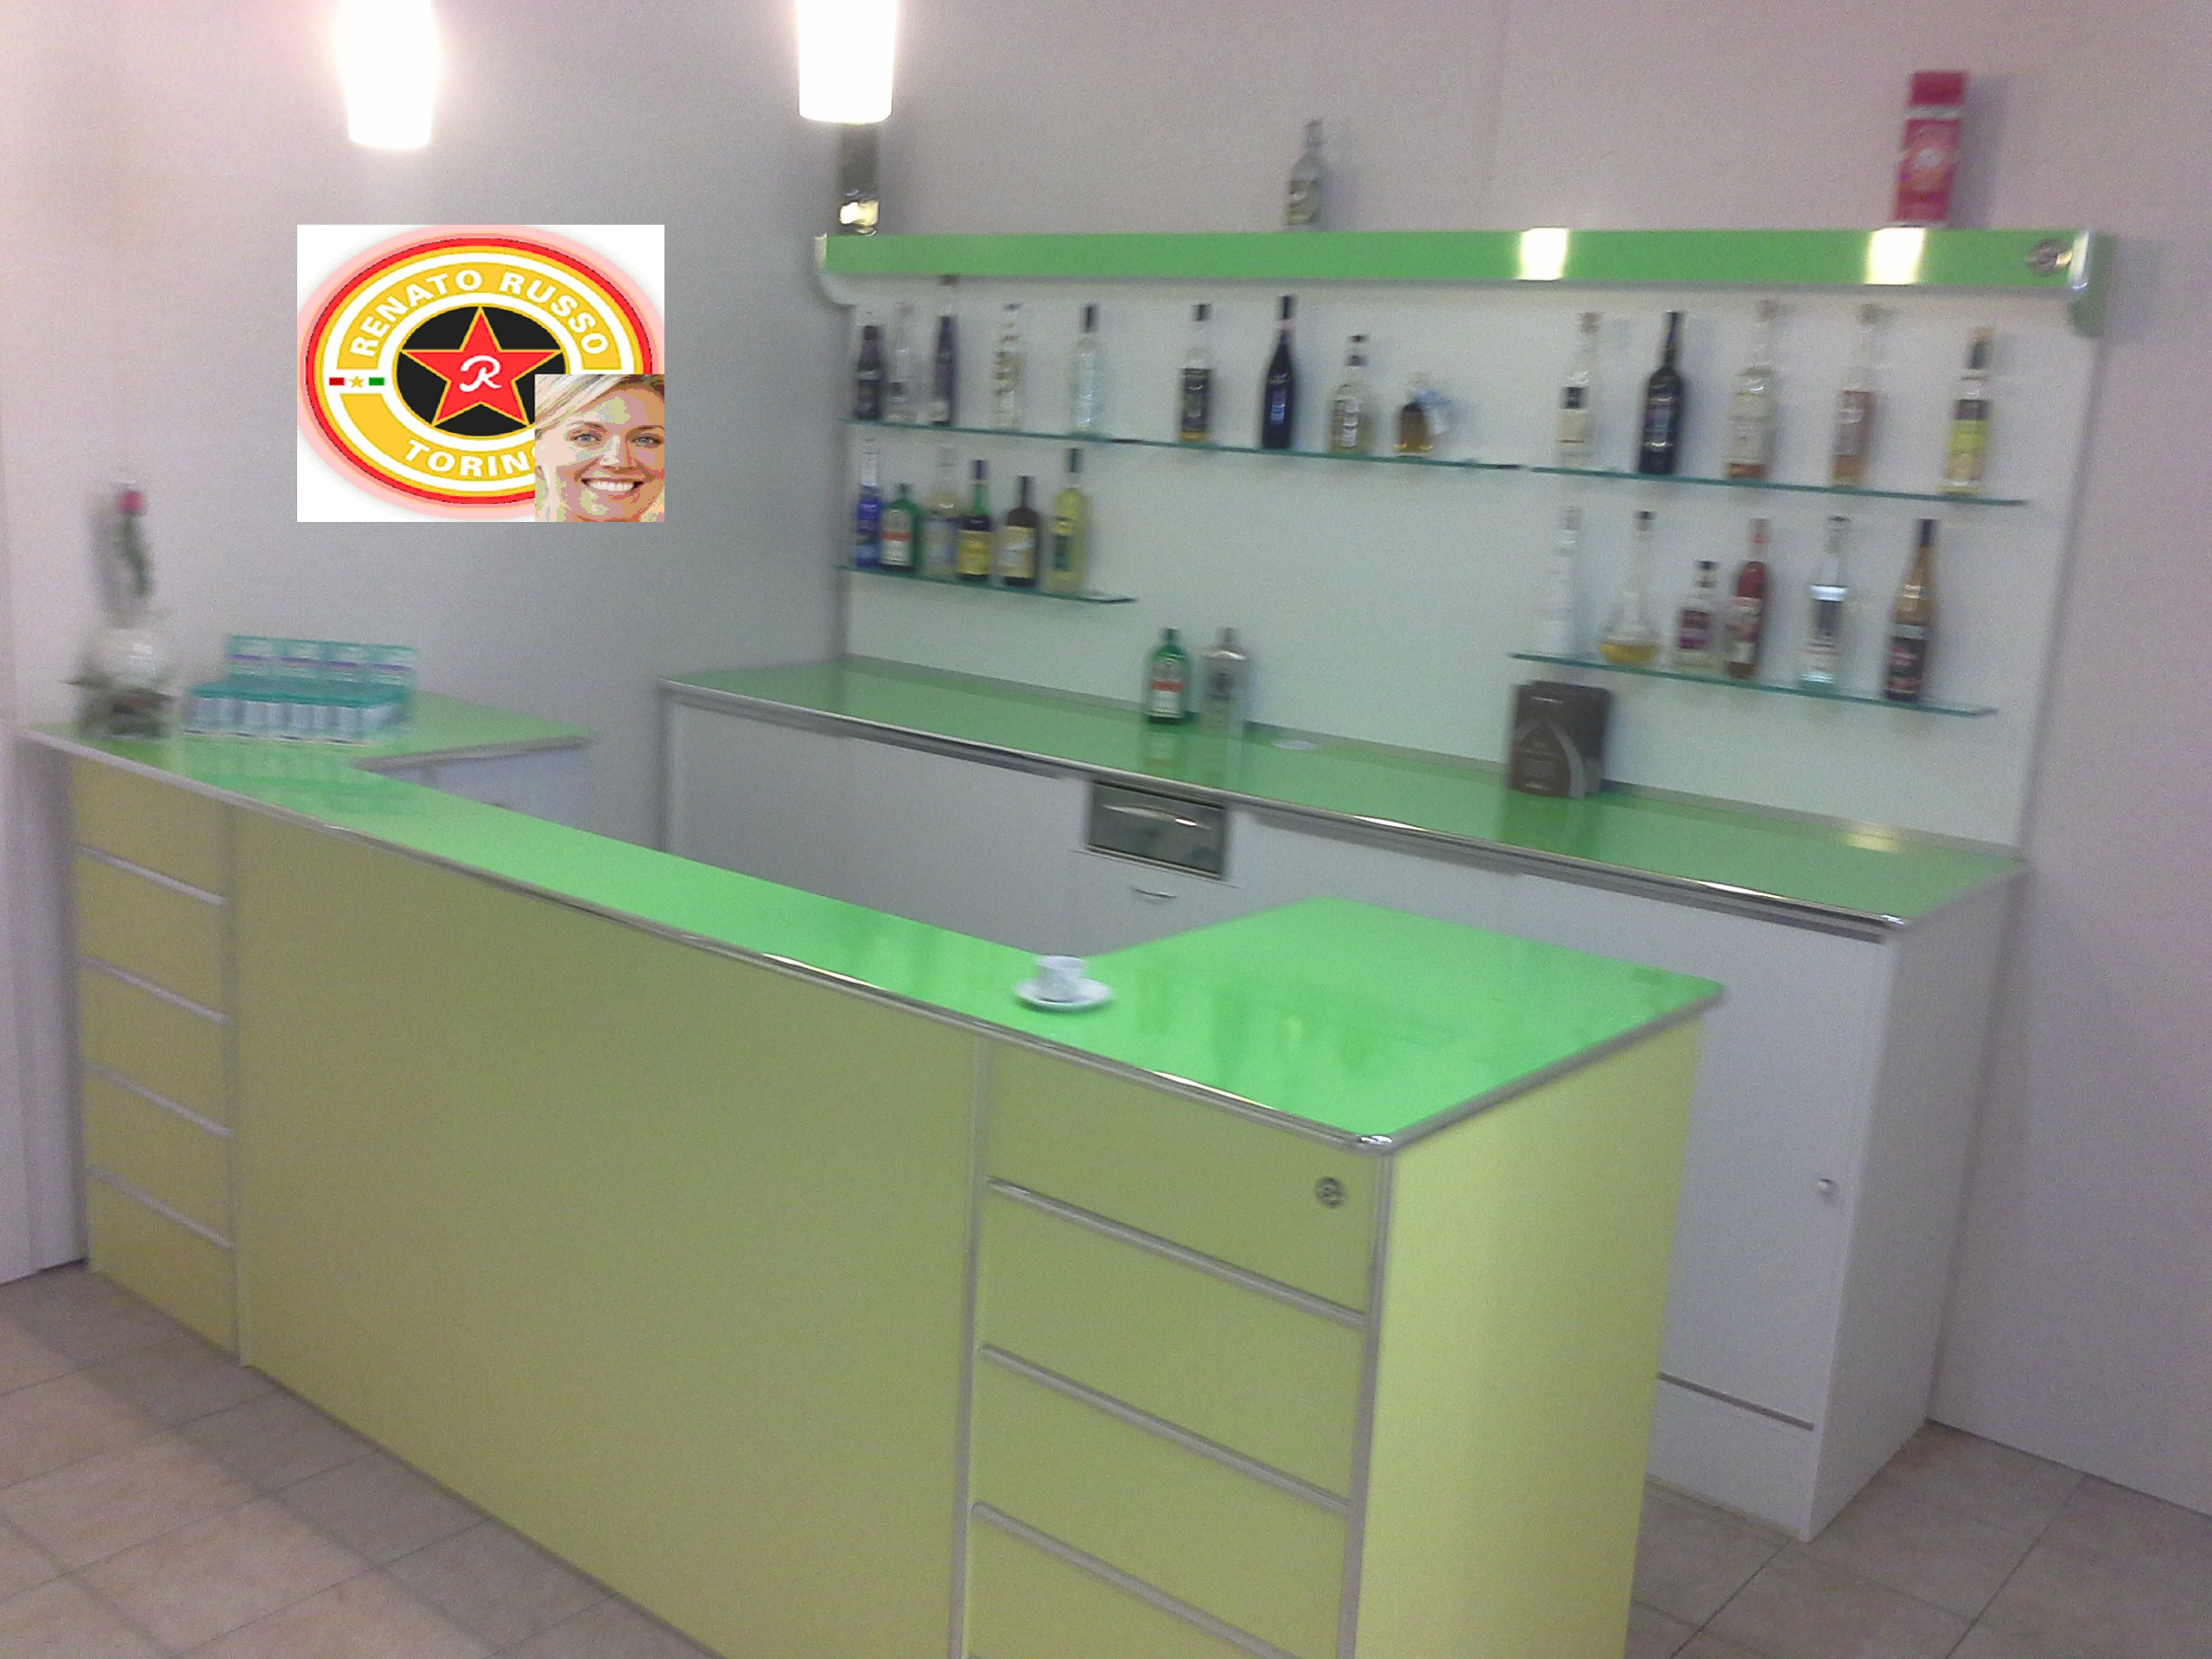 Produttori di Arredamenti per Bar, Negozi, Ristoranti, Banchi frigo ...